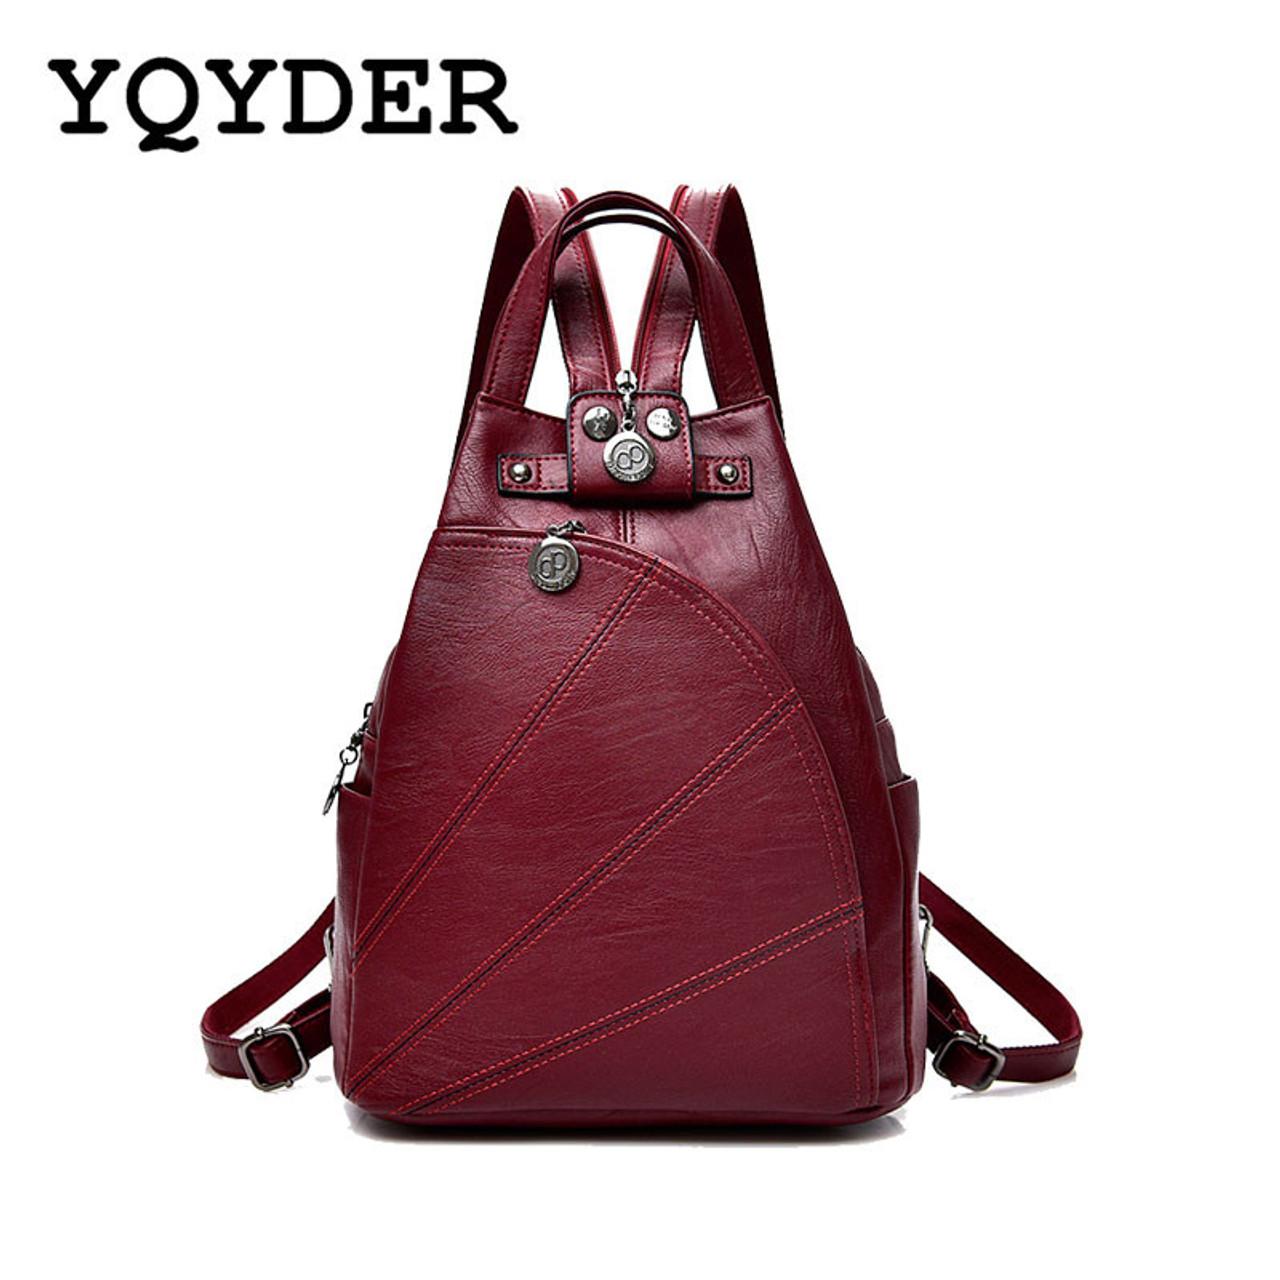 3e68100116 Fashion Leisure Women Backpacks Women s PU Leather Backpacks Female school  Shoulder bags for teenage girls Travel ...